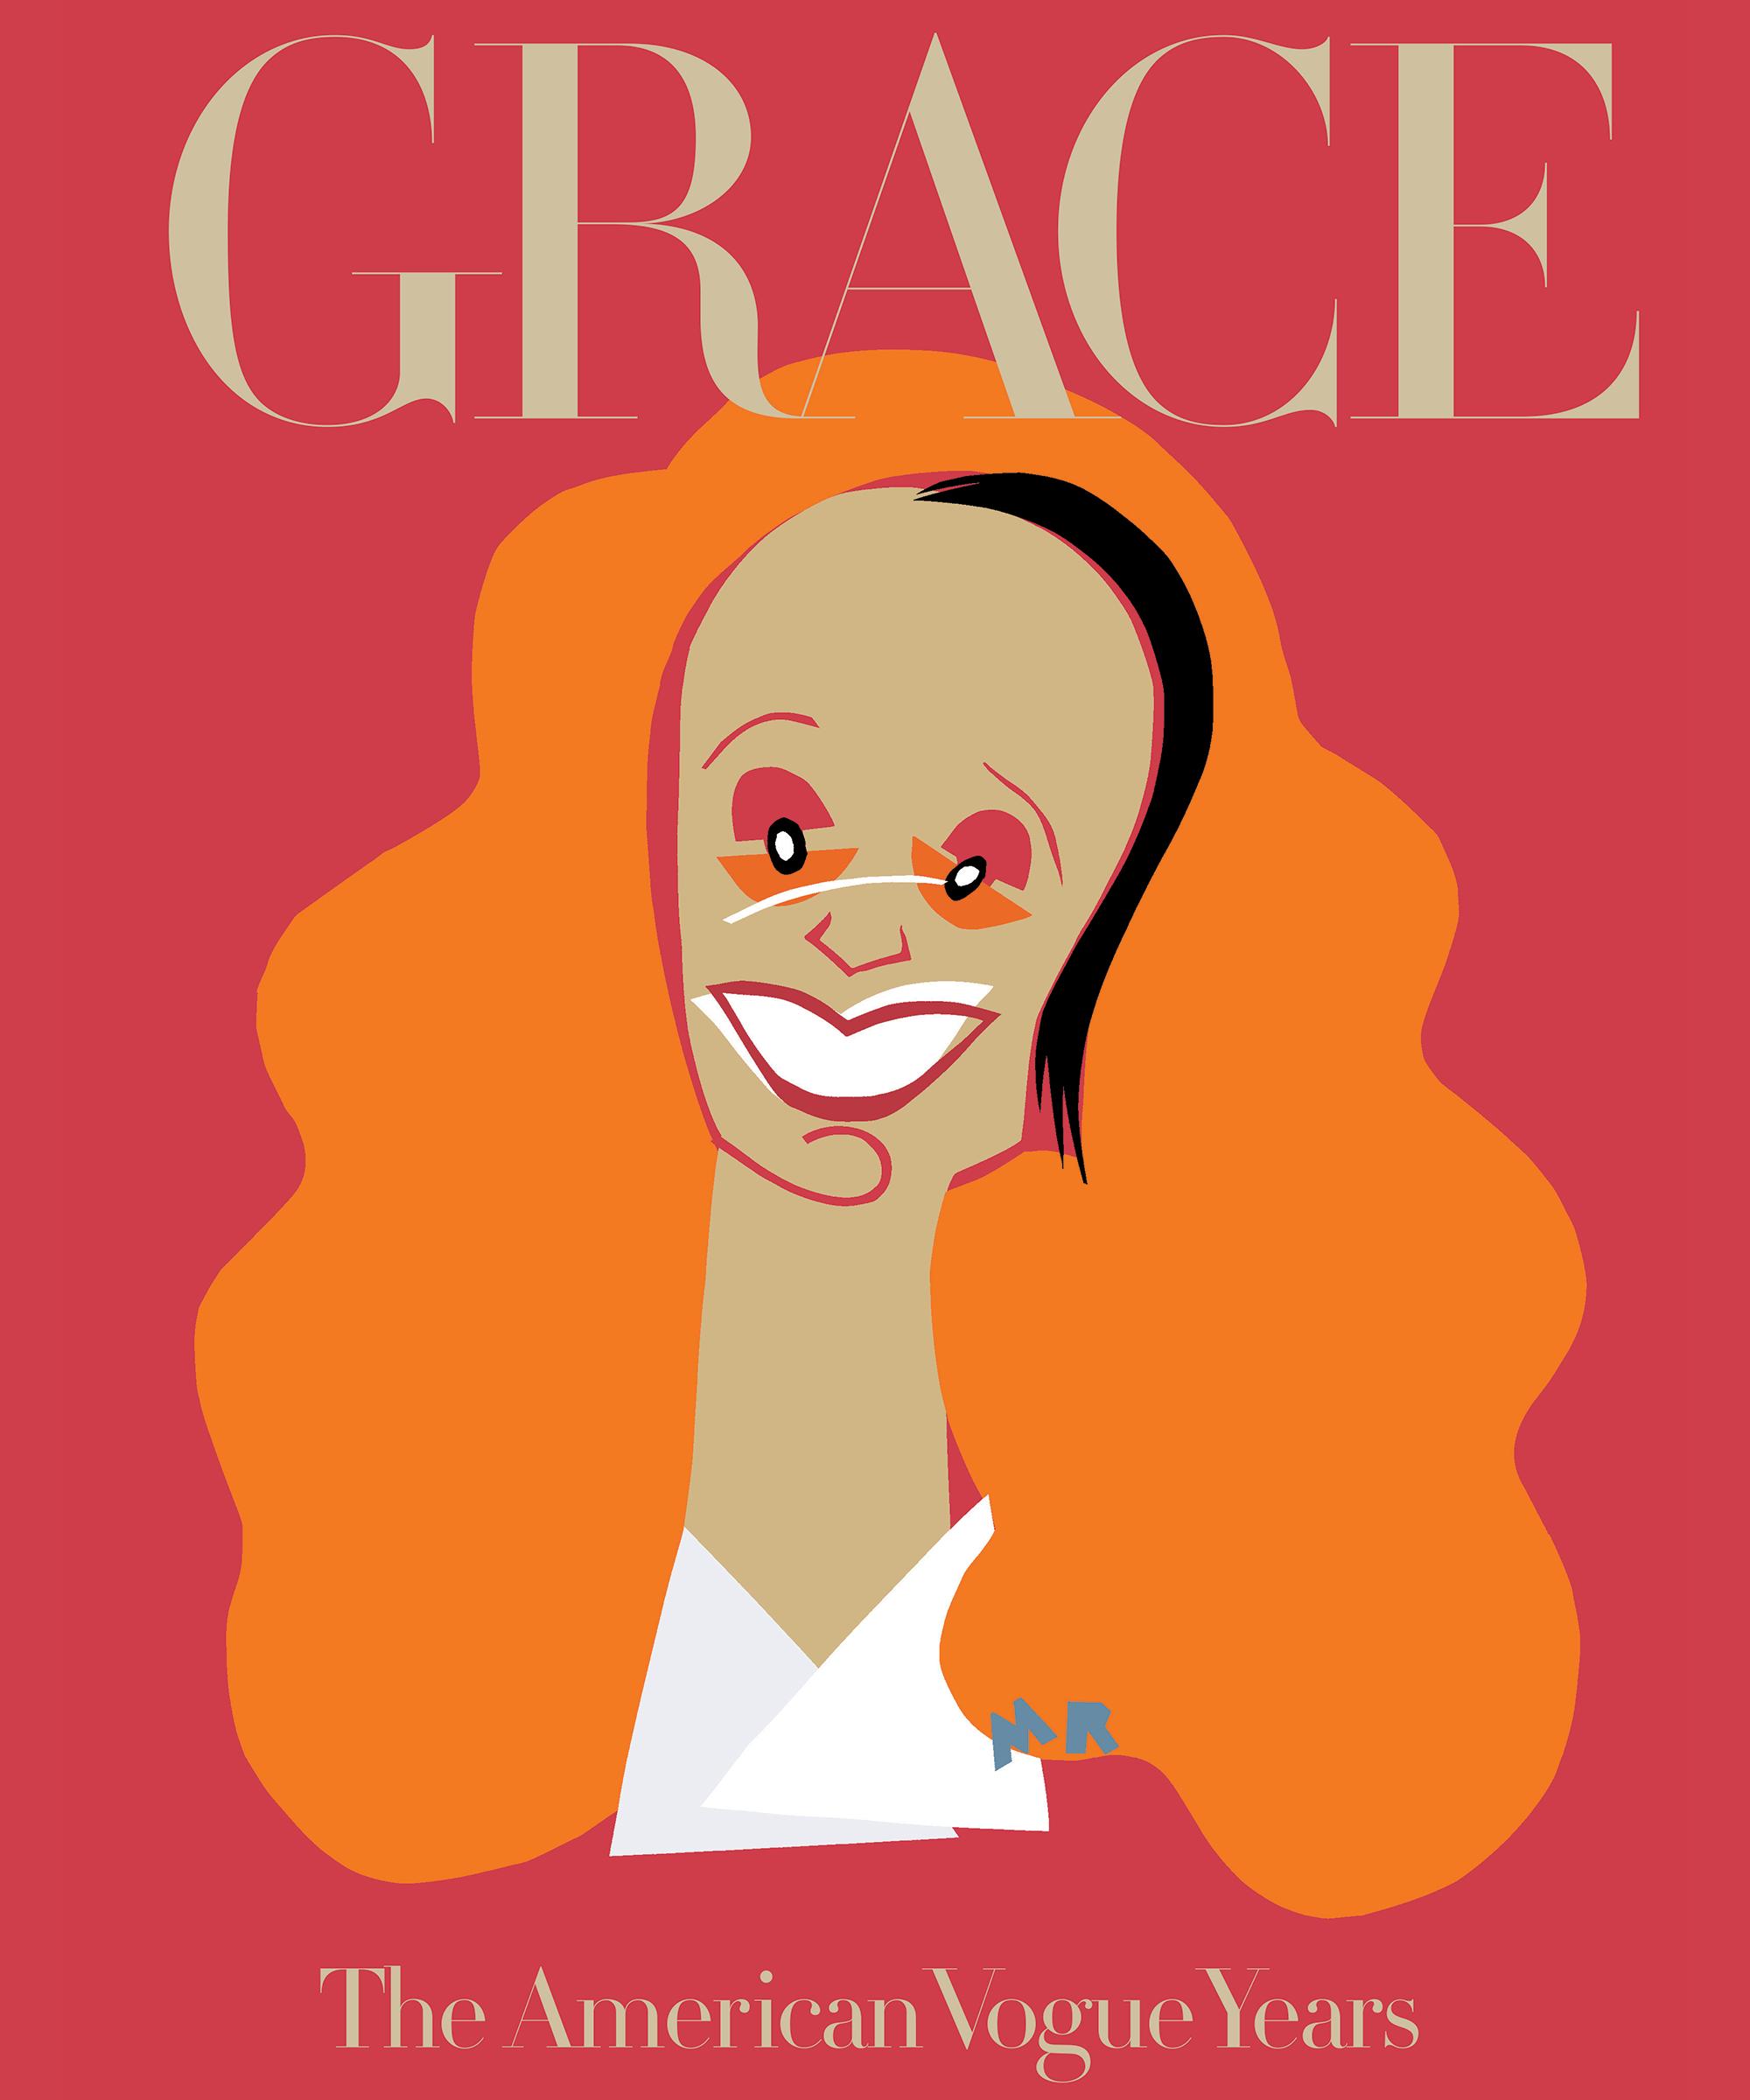 Grace-jacket-2